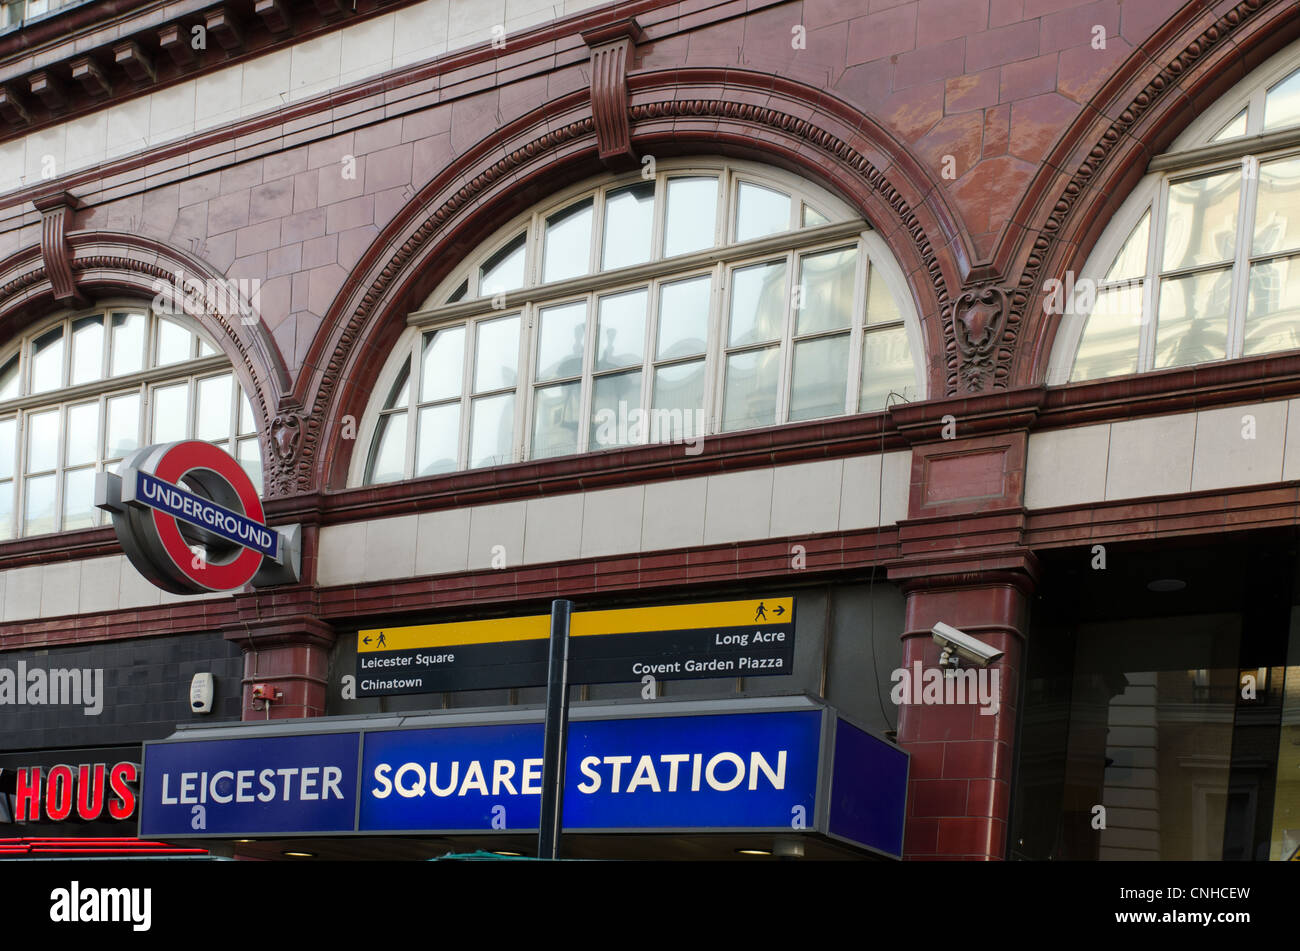 Leicester Square Tube station sign,  Cranbourne street London Uk - Stock Image